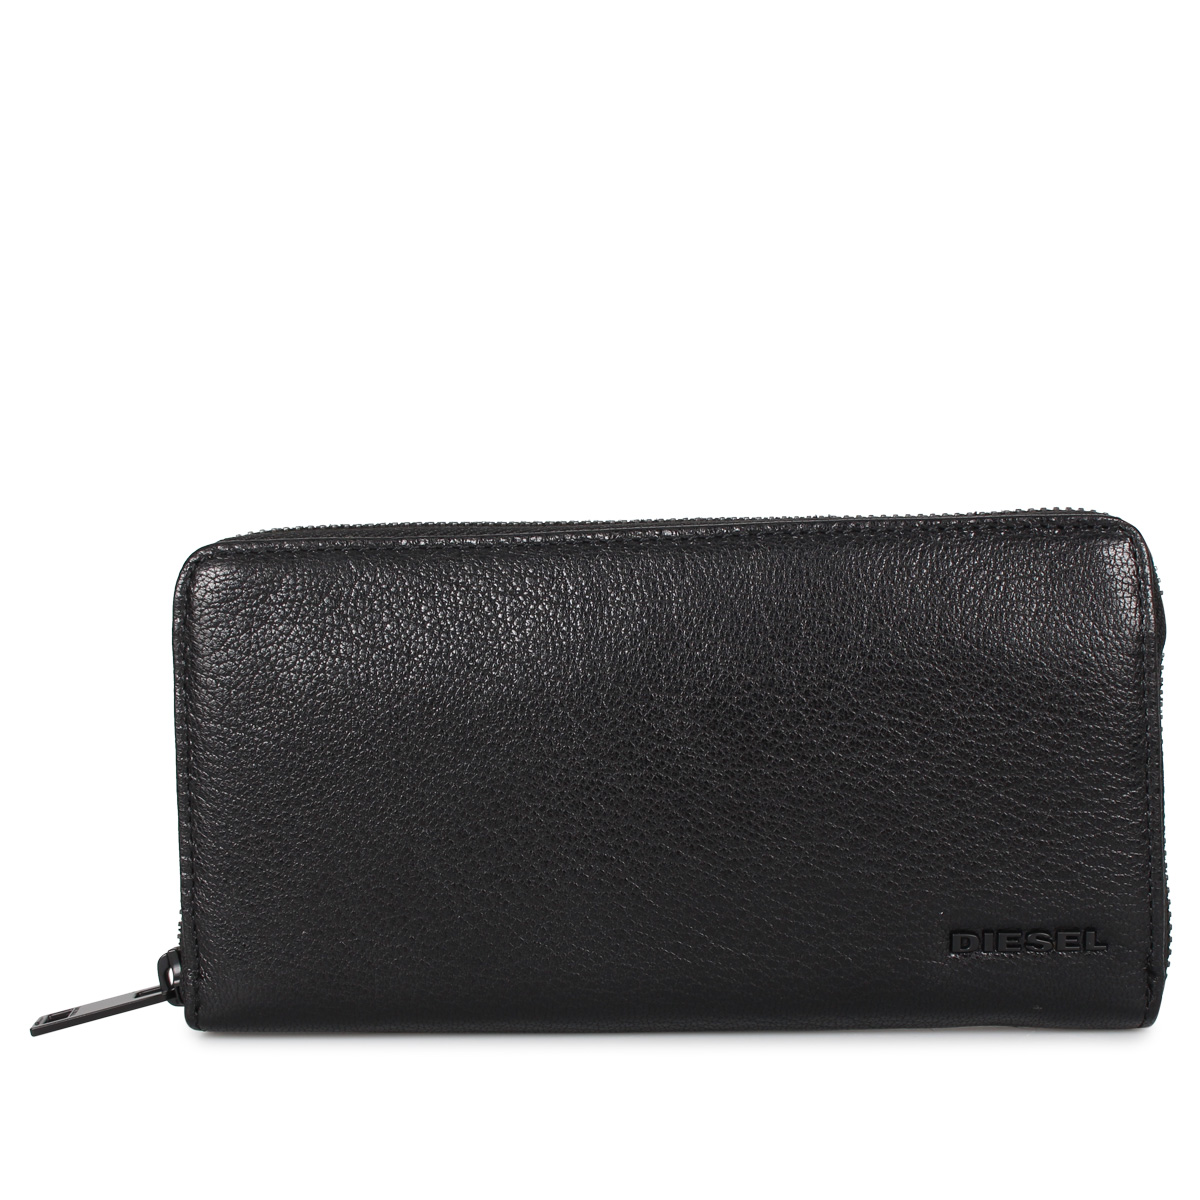 DIESEL 24 ZIP ディーゼル 財布 長財布 メンズ ブラック 黒 X06641-P3043